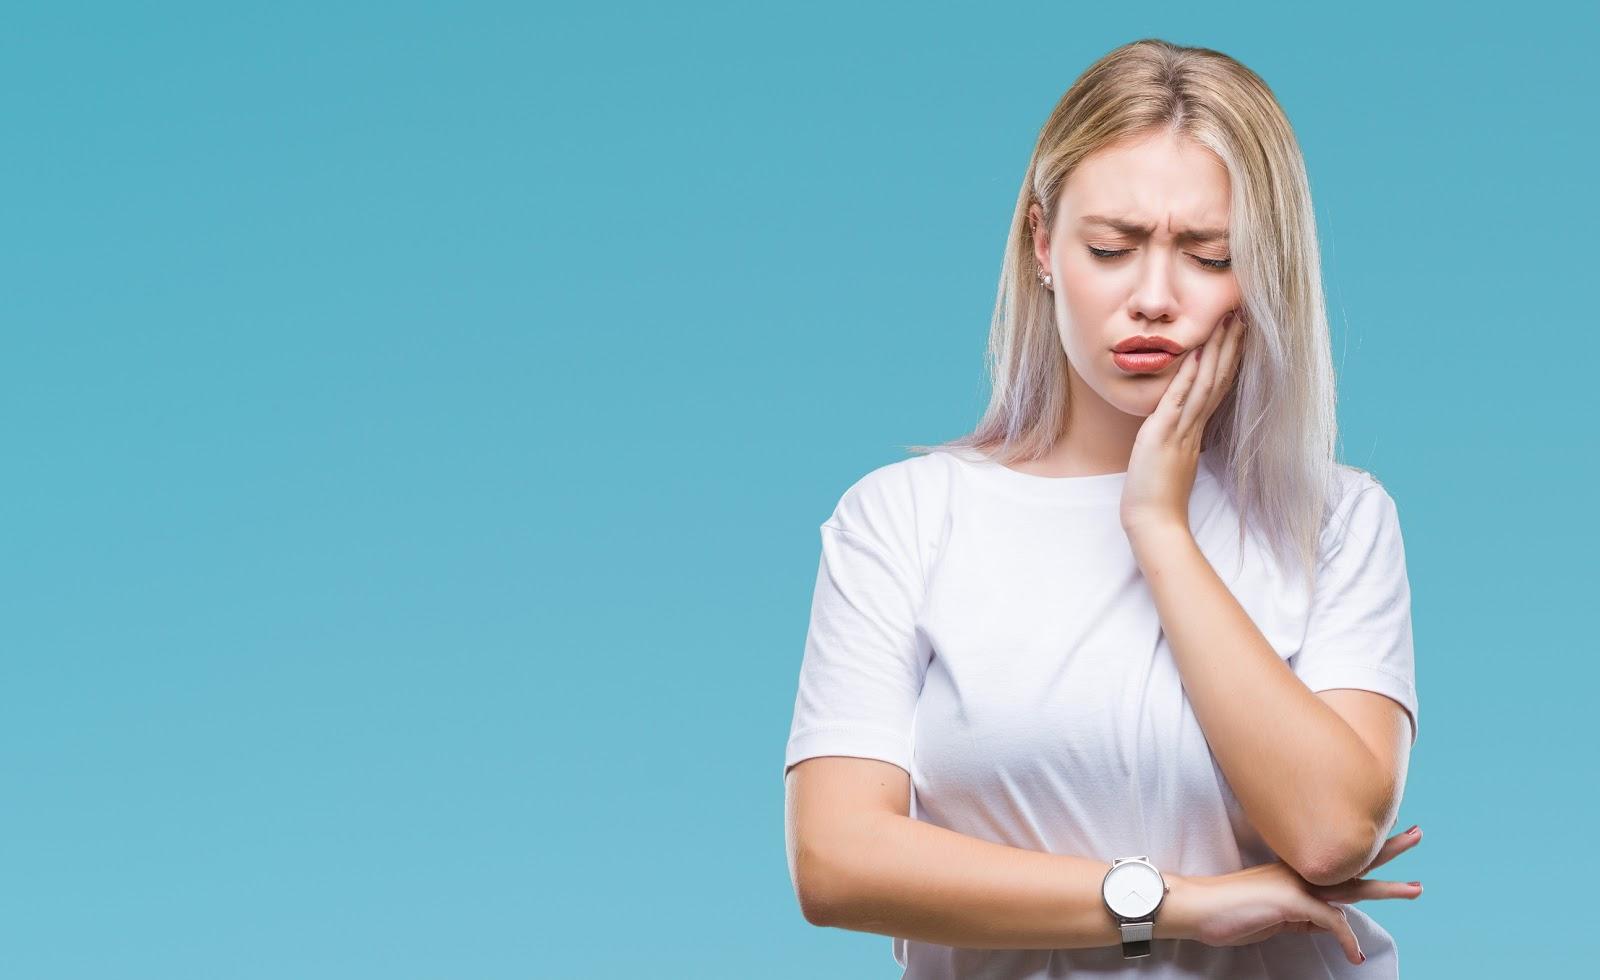 Ascesso gengivale sintomi